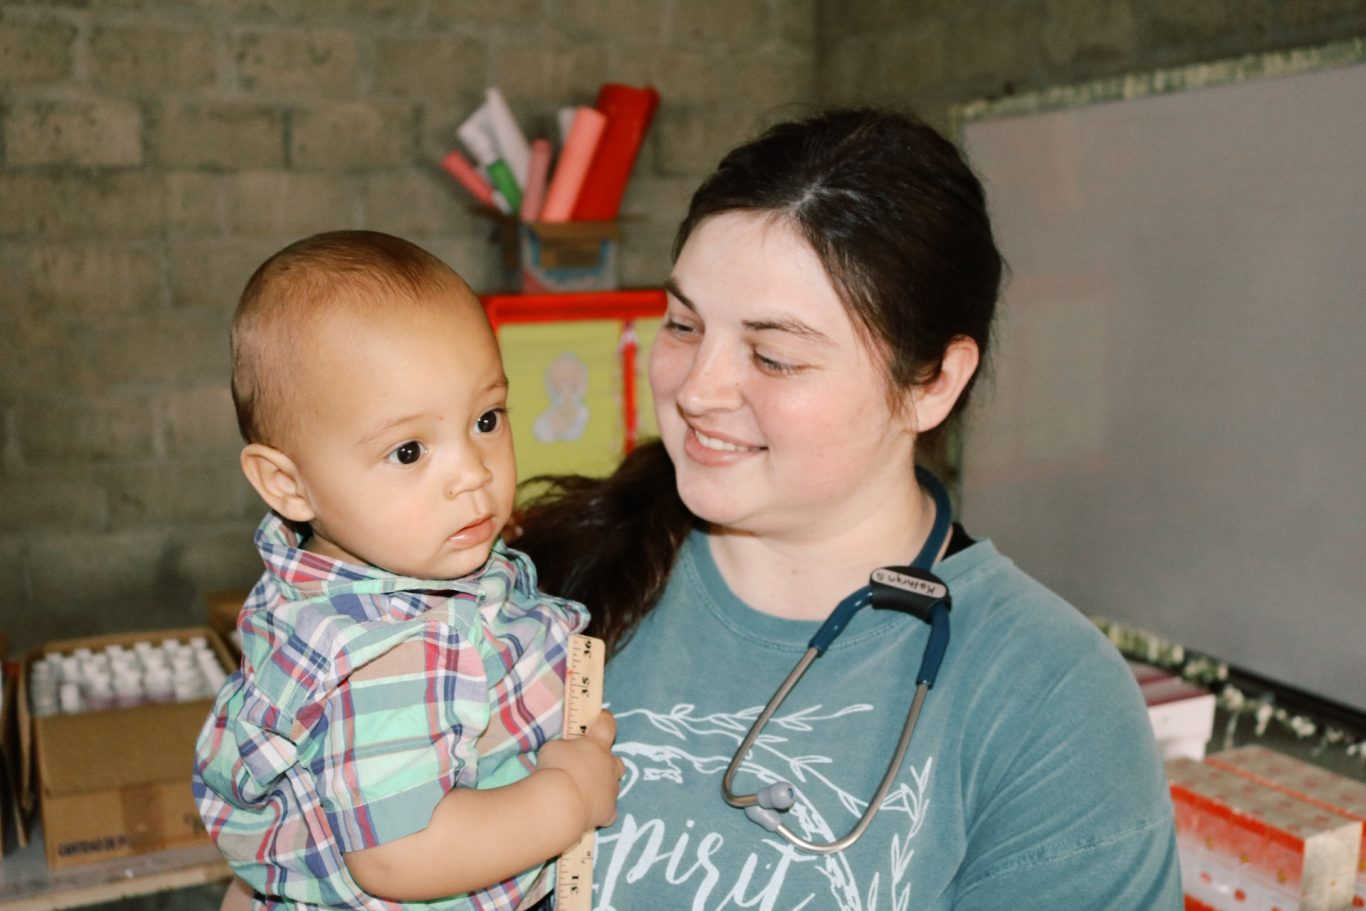 Nurse with child